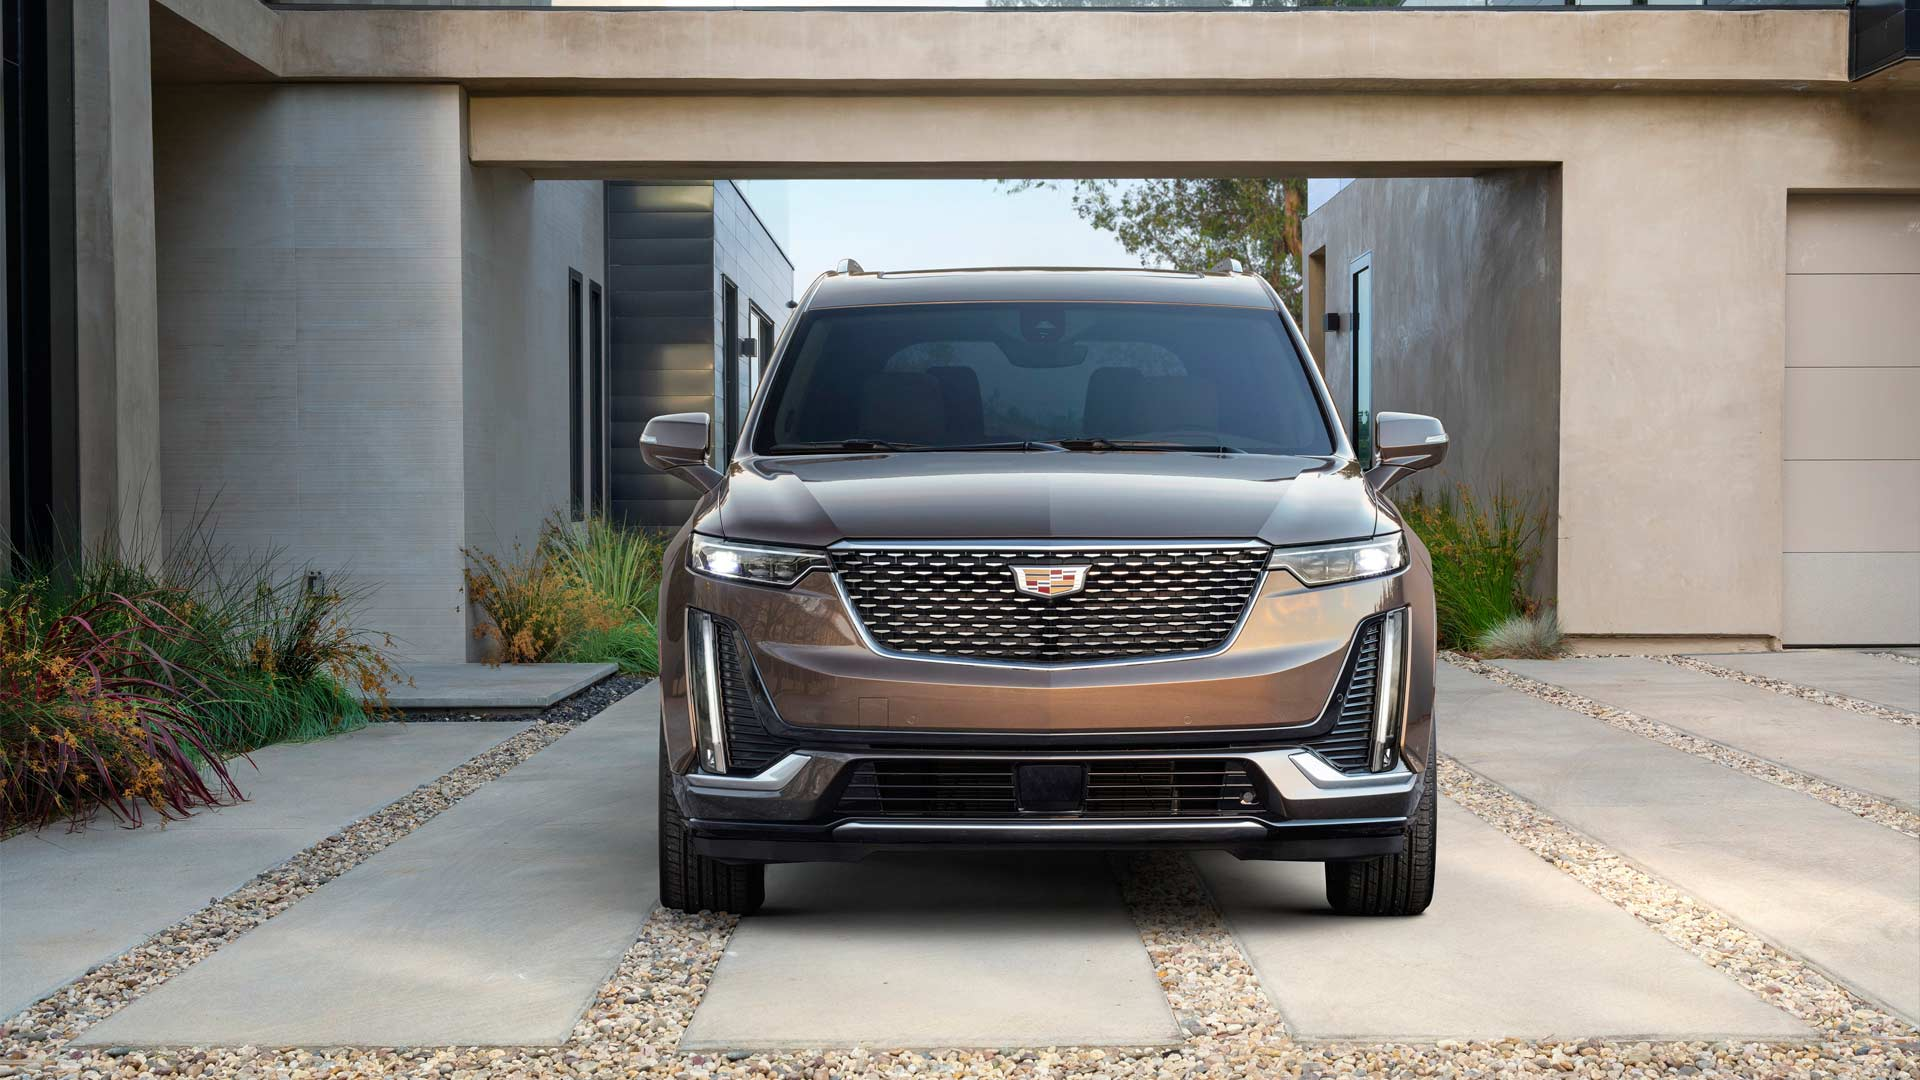 2020-Cadillac-XT6-Luxury